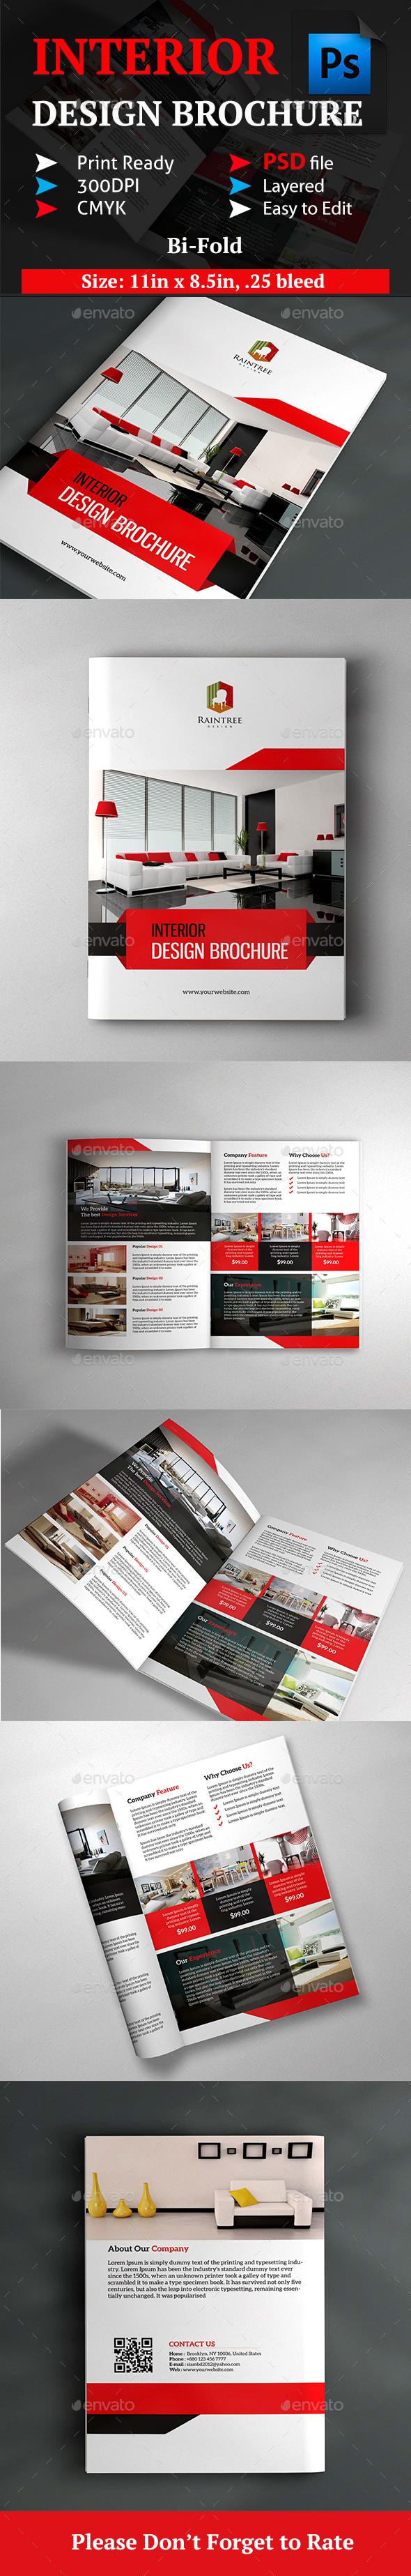 Interior Design Brochure - Brochures Print Templates